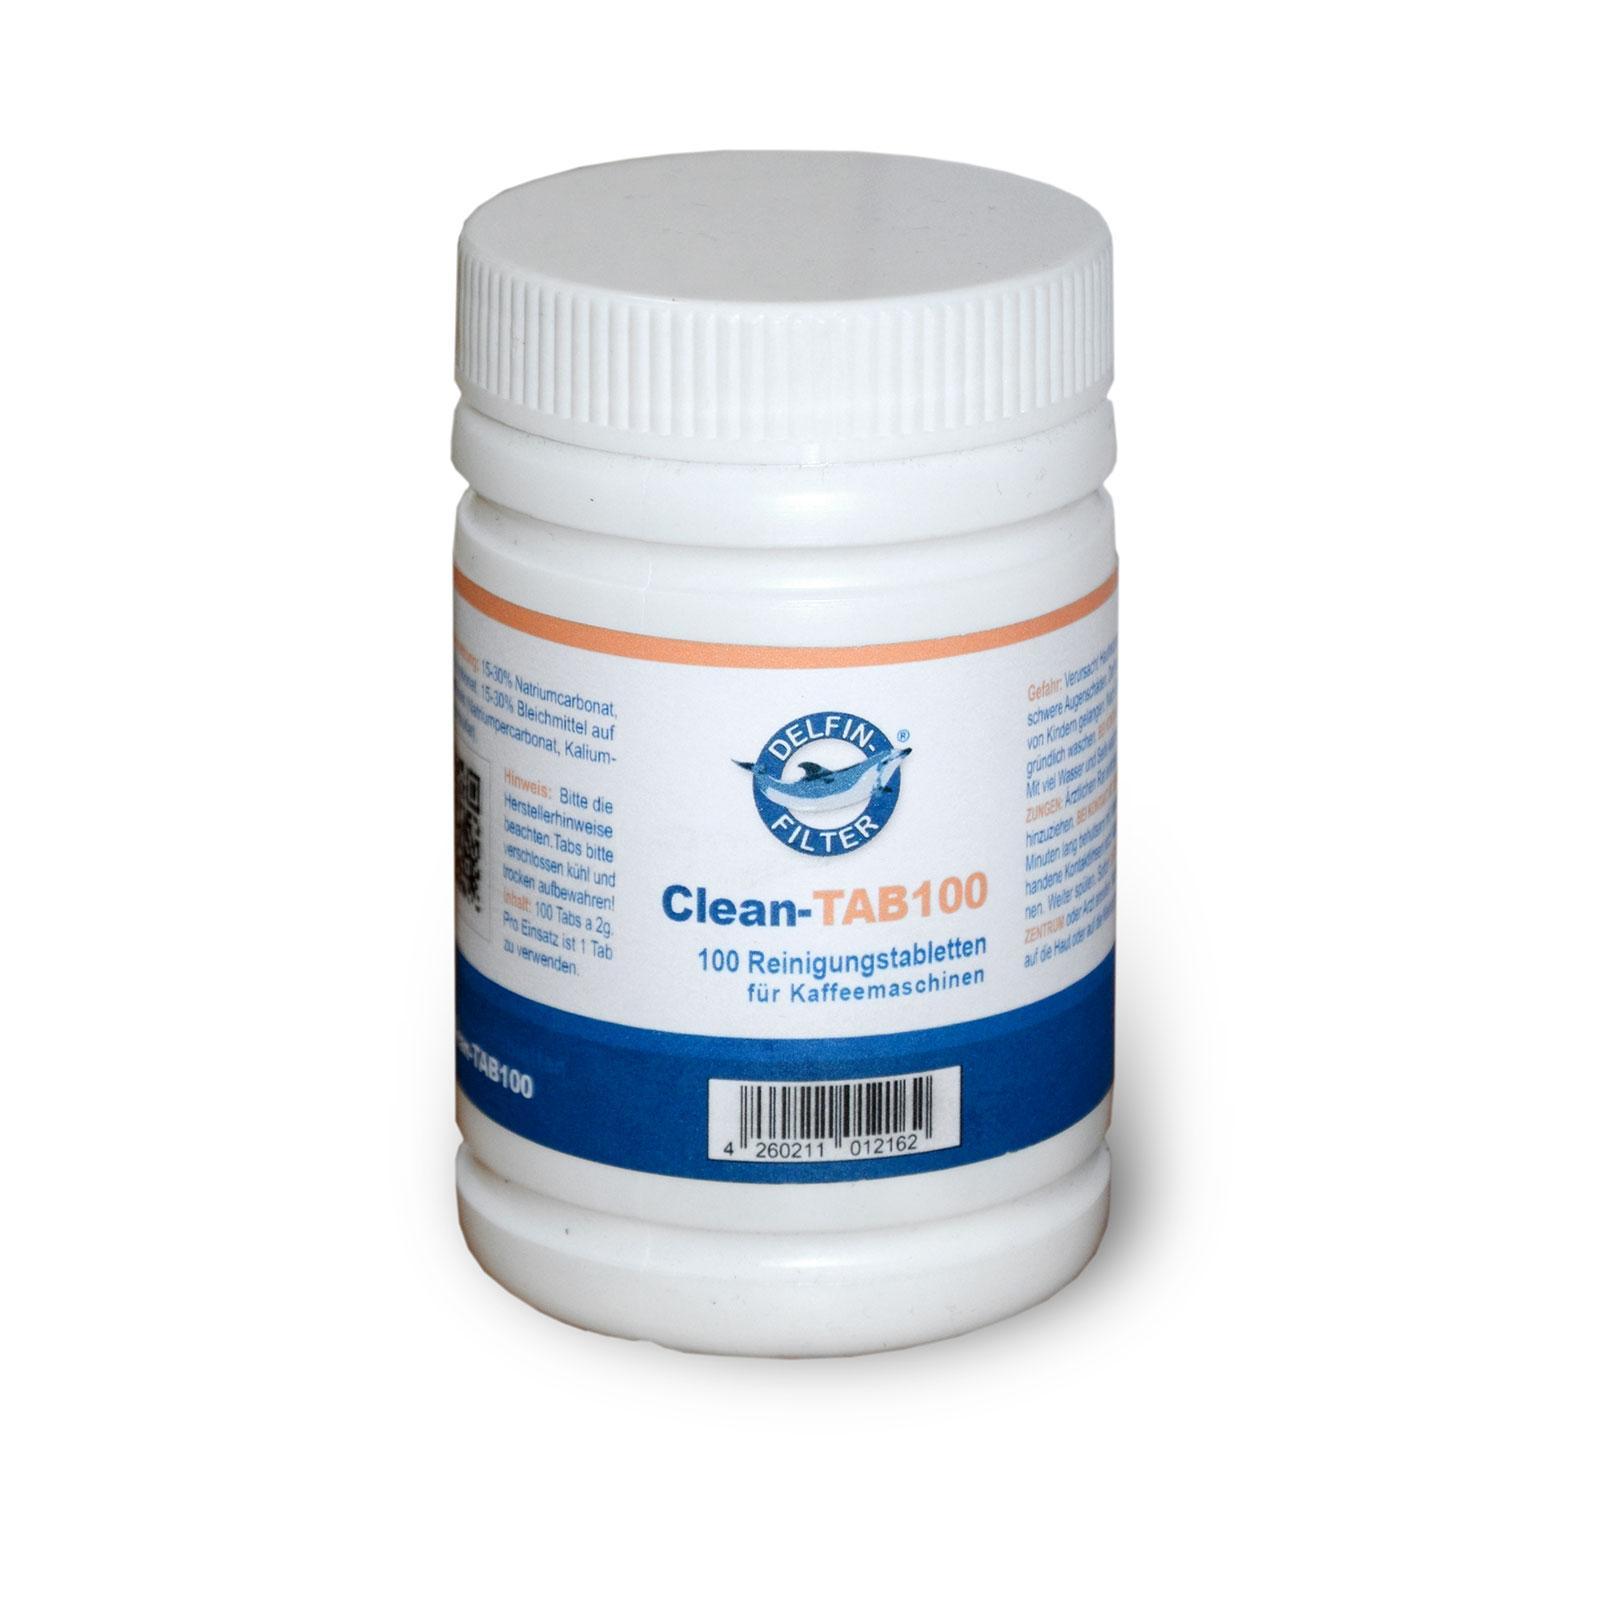 100 Reinigungs Tabletten 2g, kompatibel mit Jura Melitta Siemens Seaco WMF Kaffeemaschinen